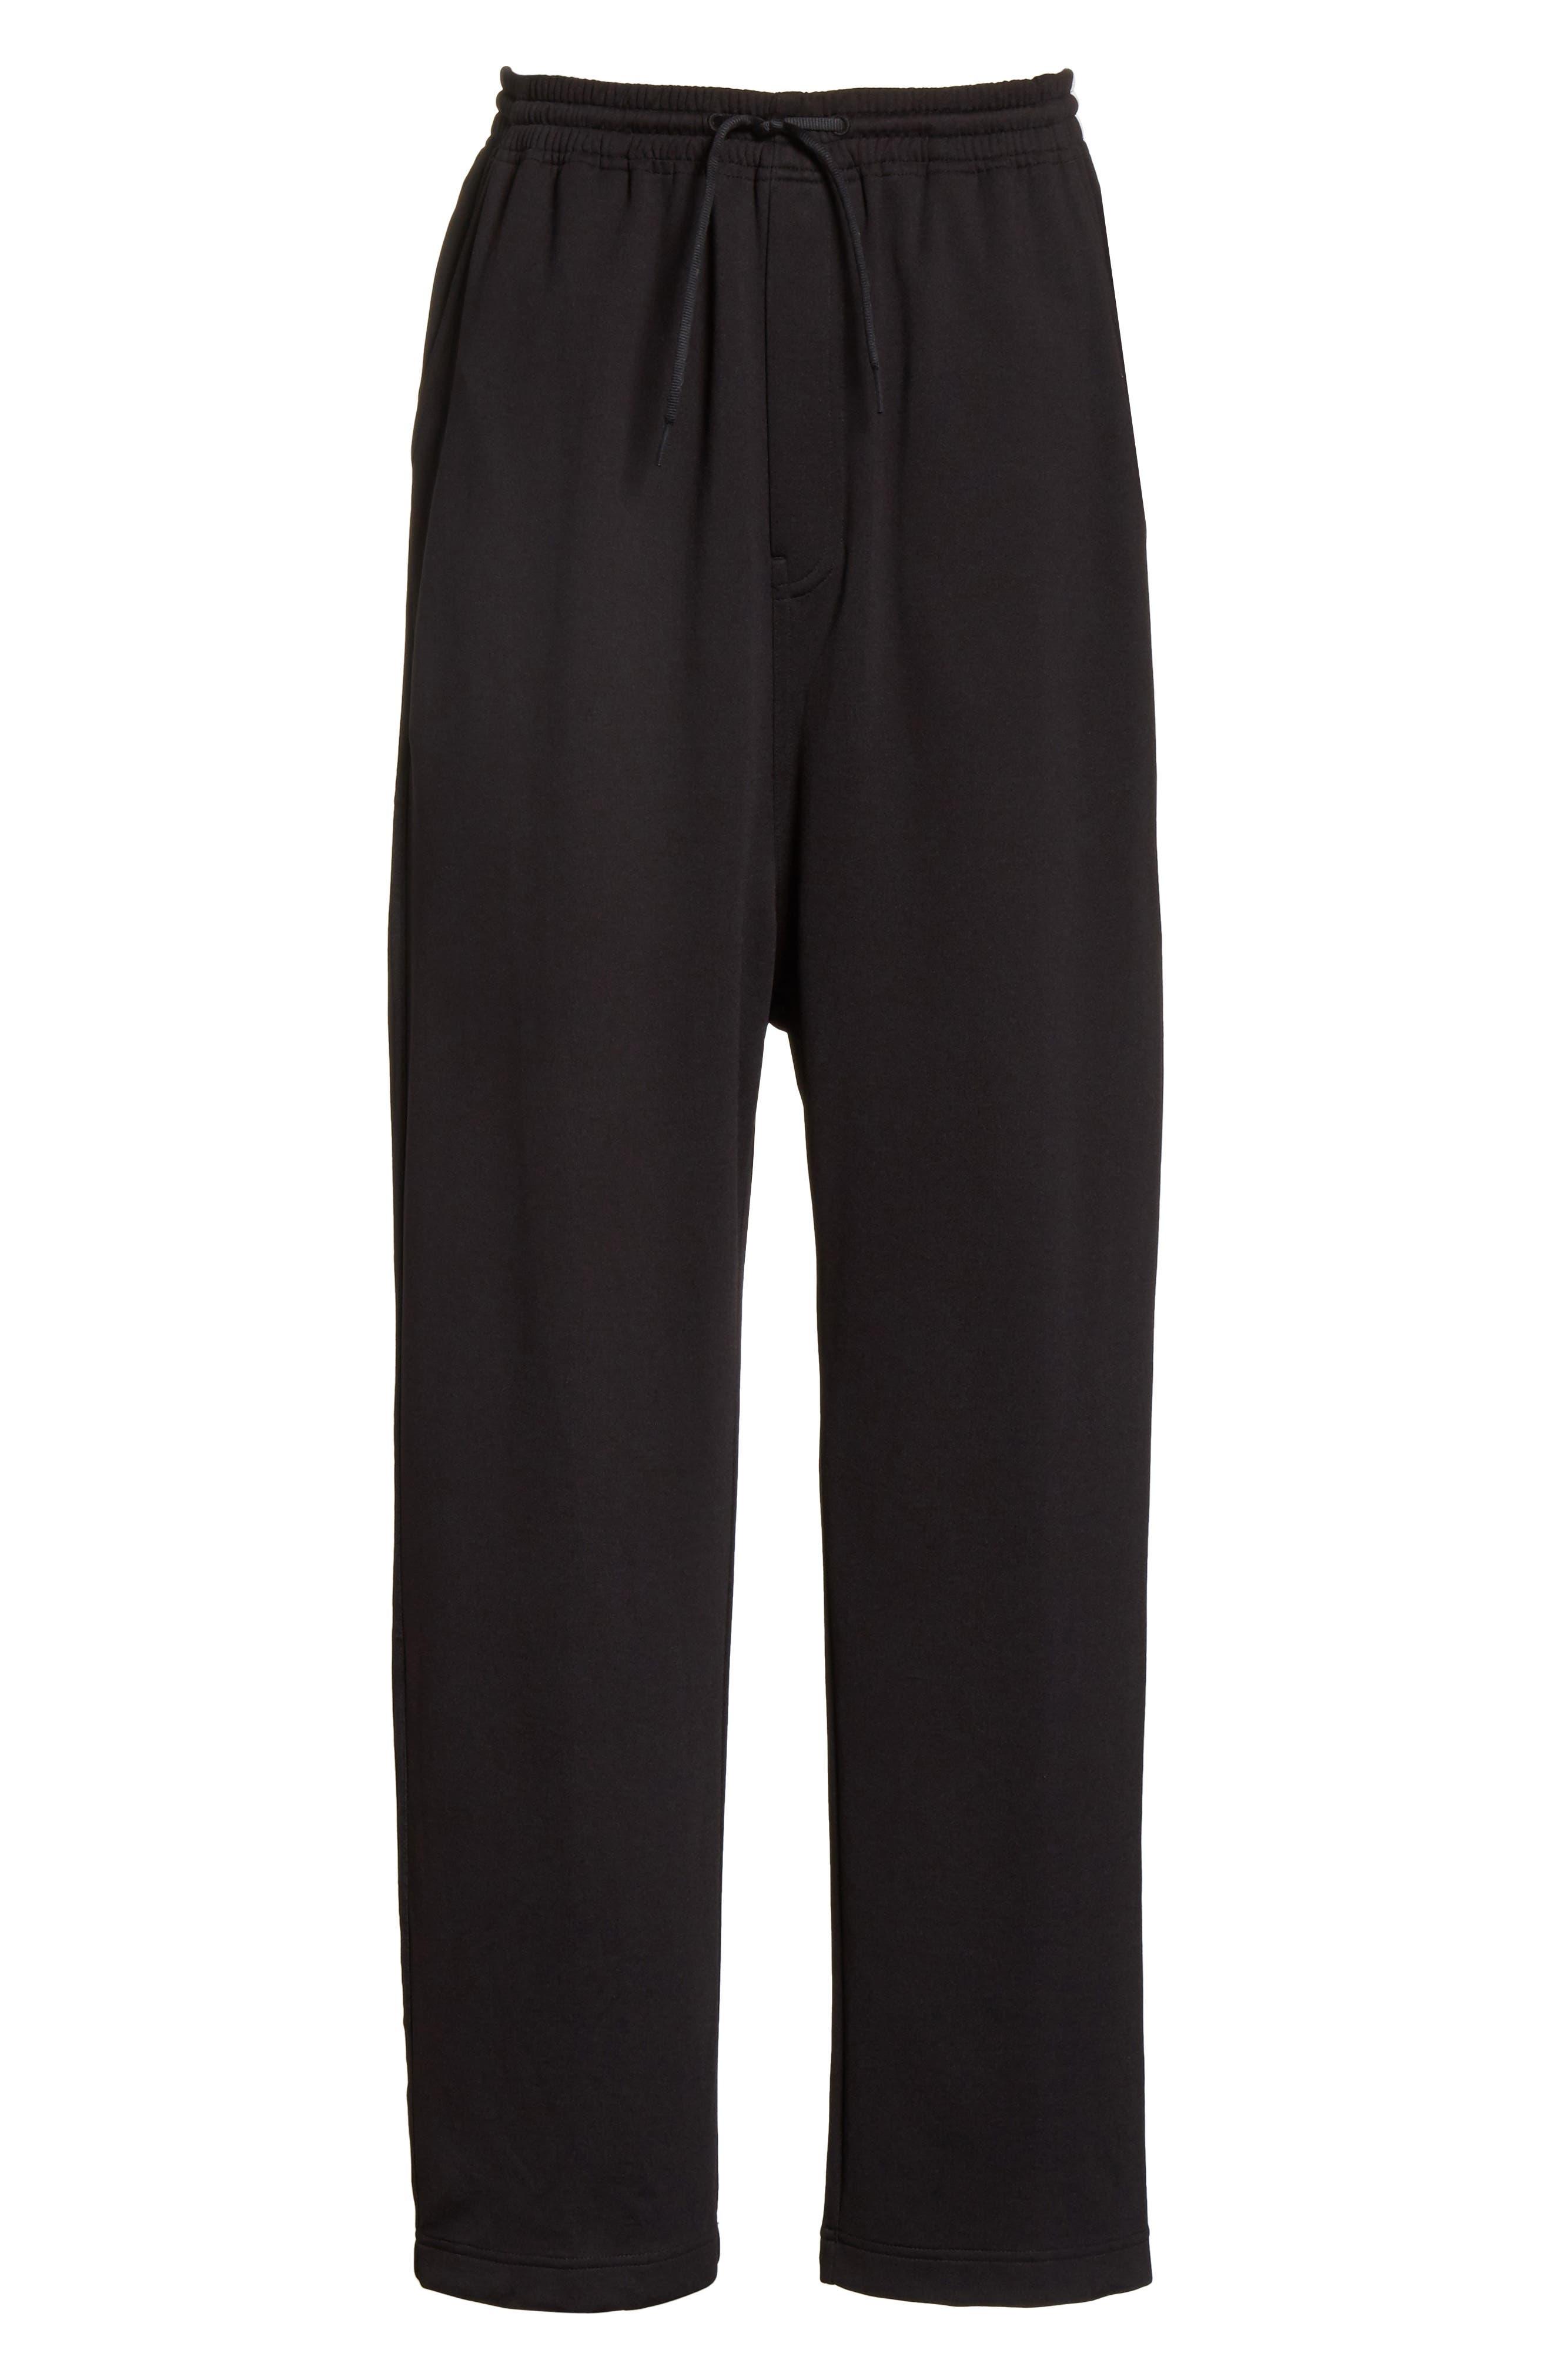 x adidas Wide Leg Track Pants,                             Alternate thumbnail 6, color,                             001